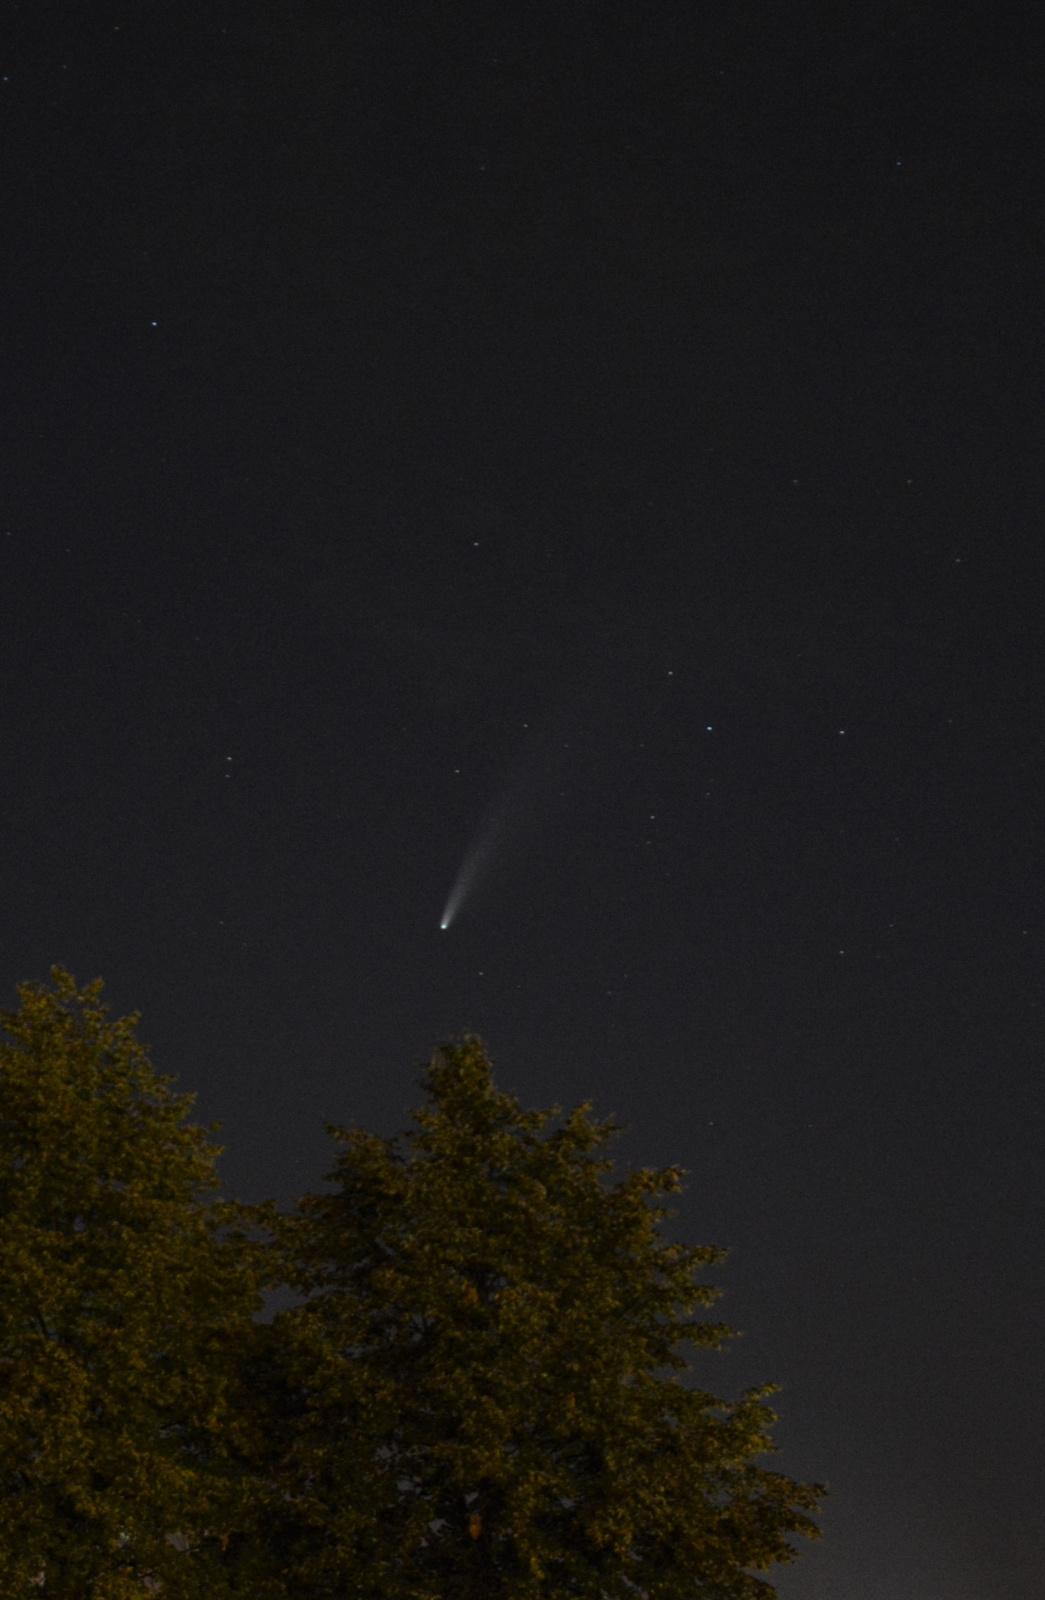 NEOWISE C2020 F3.jpg